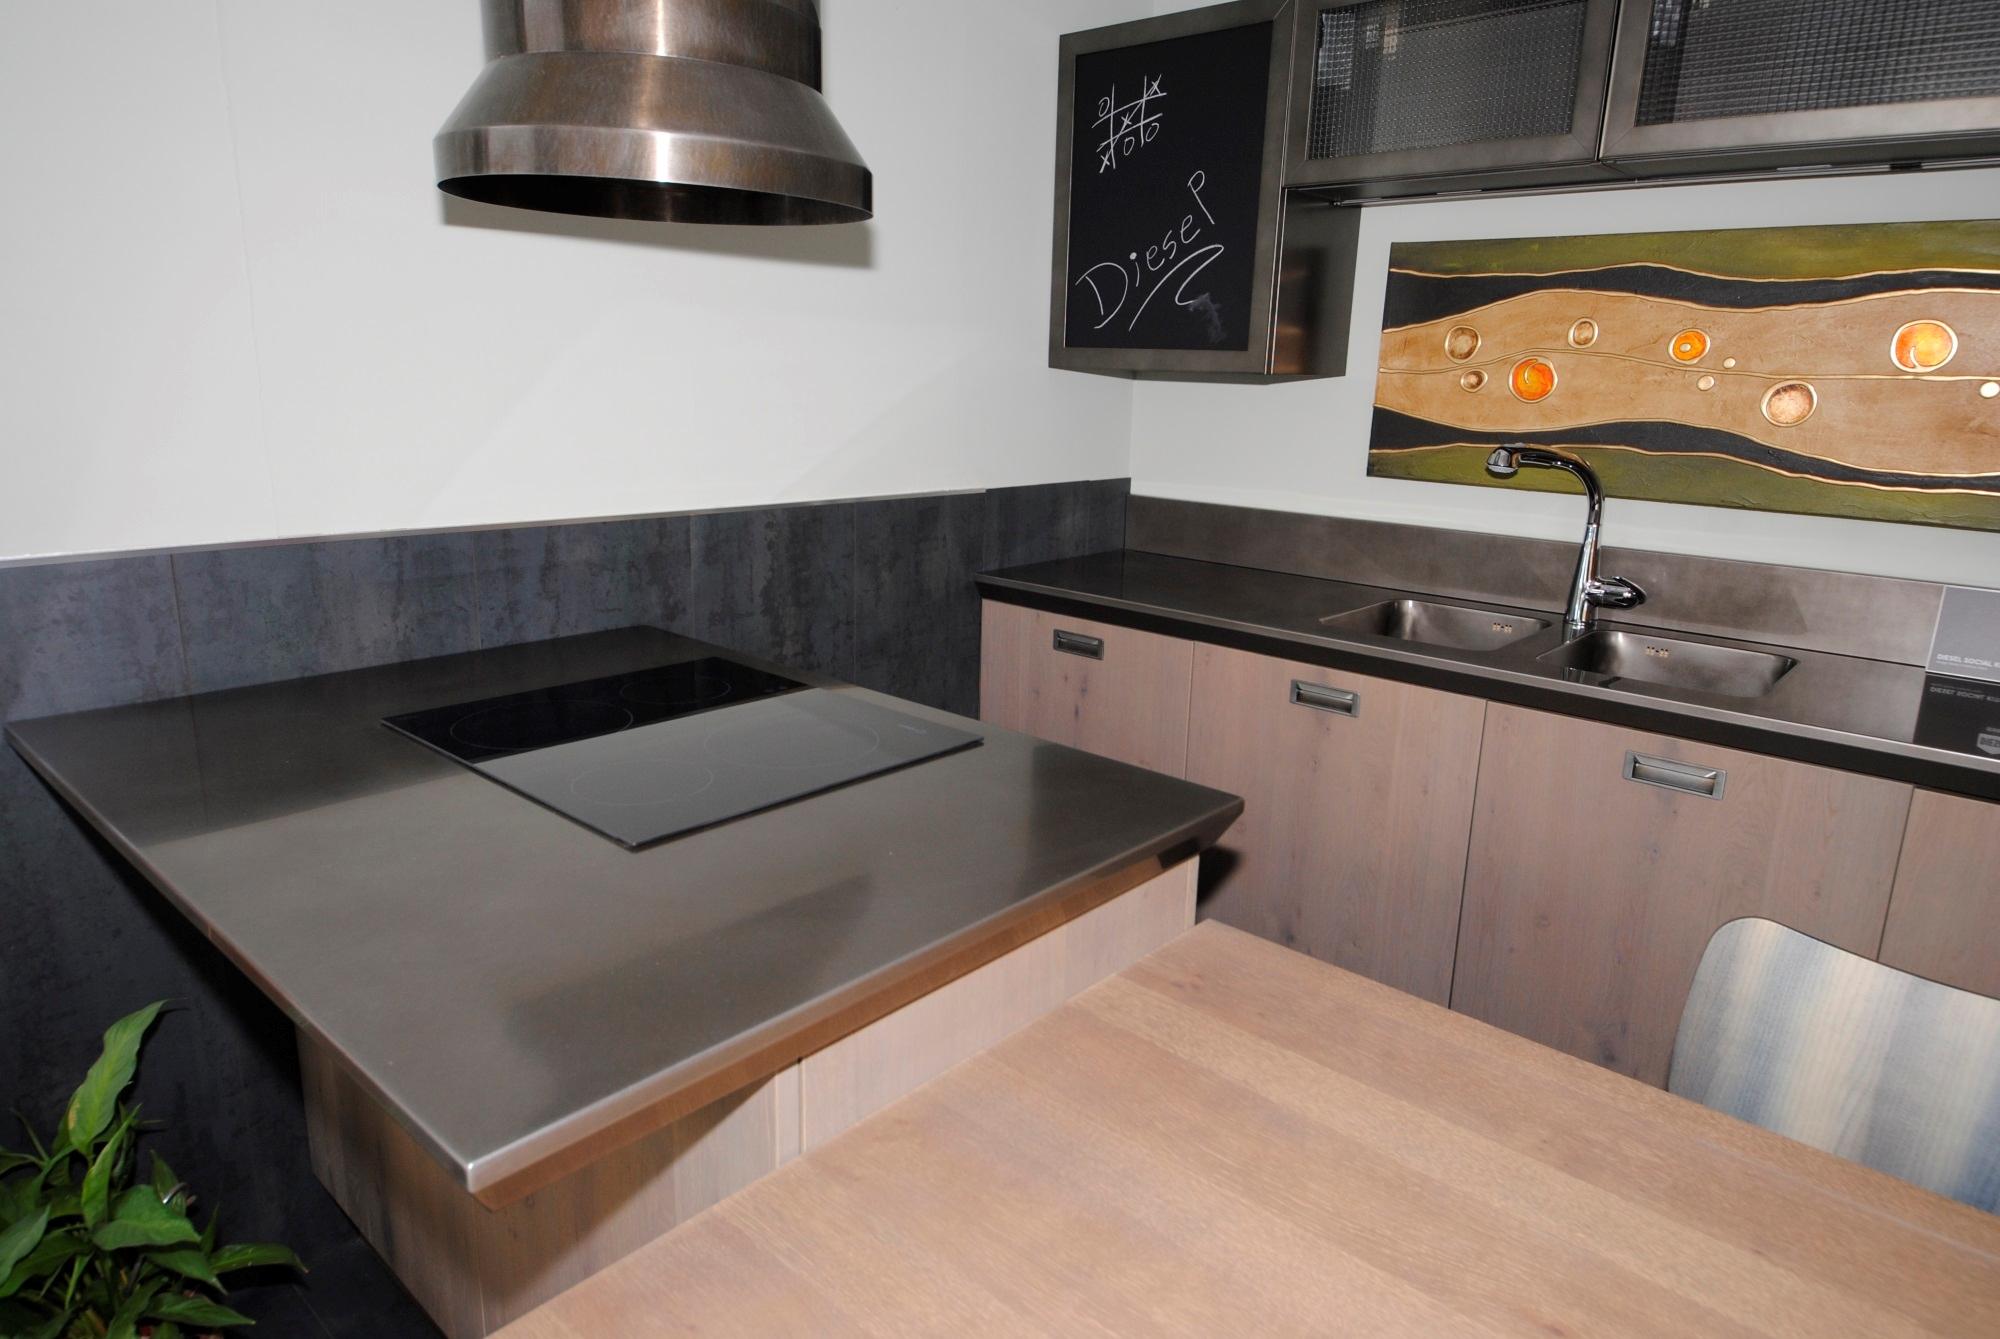 Scavolini cucina diesel stile industriale con acciaio drip - Cucina diesel scavolini ...